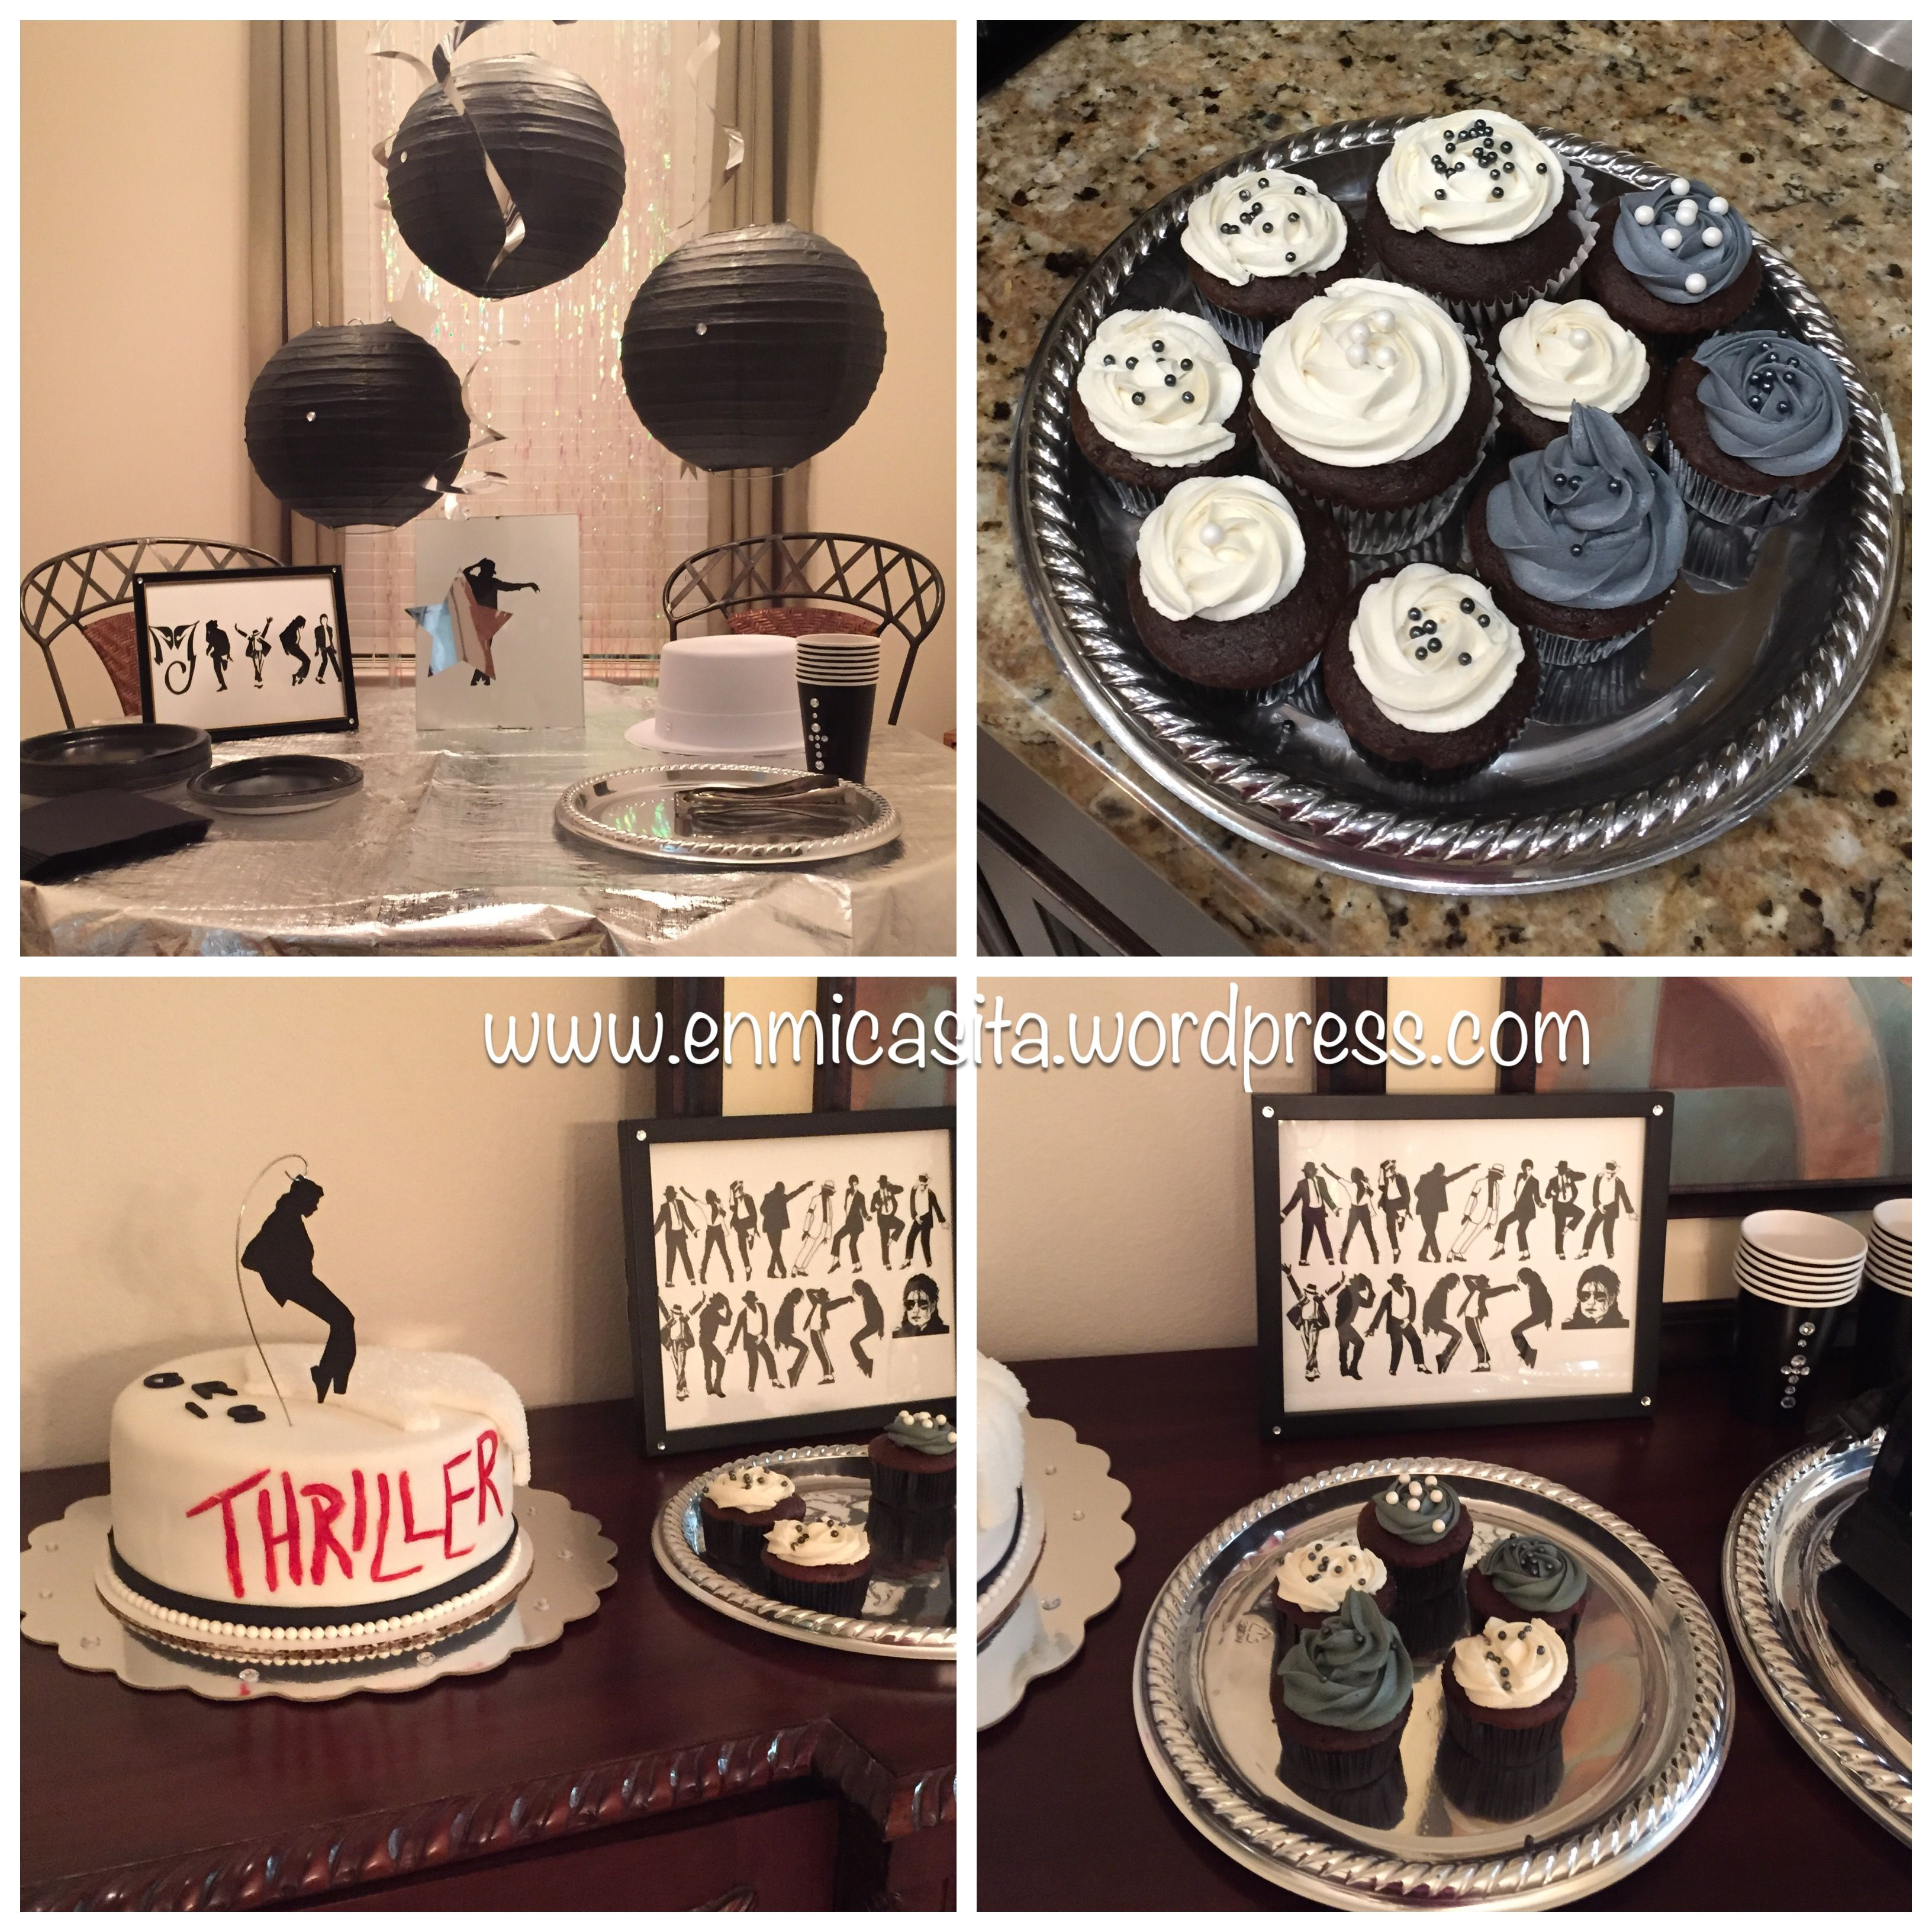 Michael Jackson Thriller Birthday Party and Cake Michael jackson